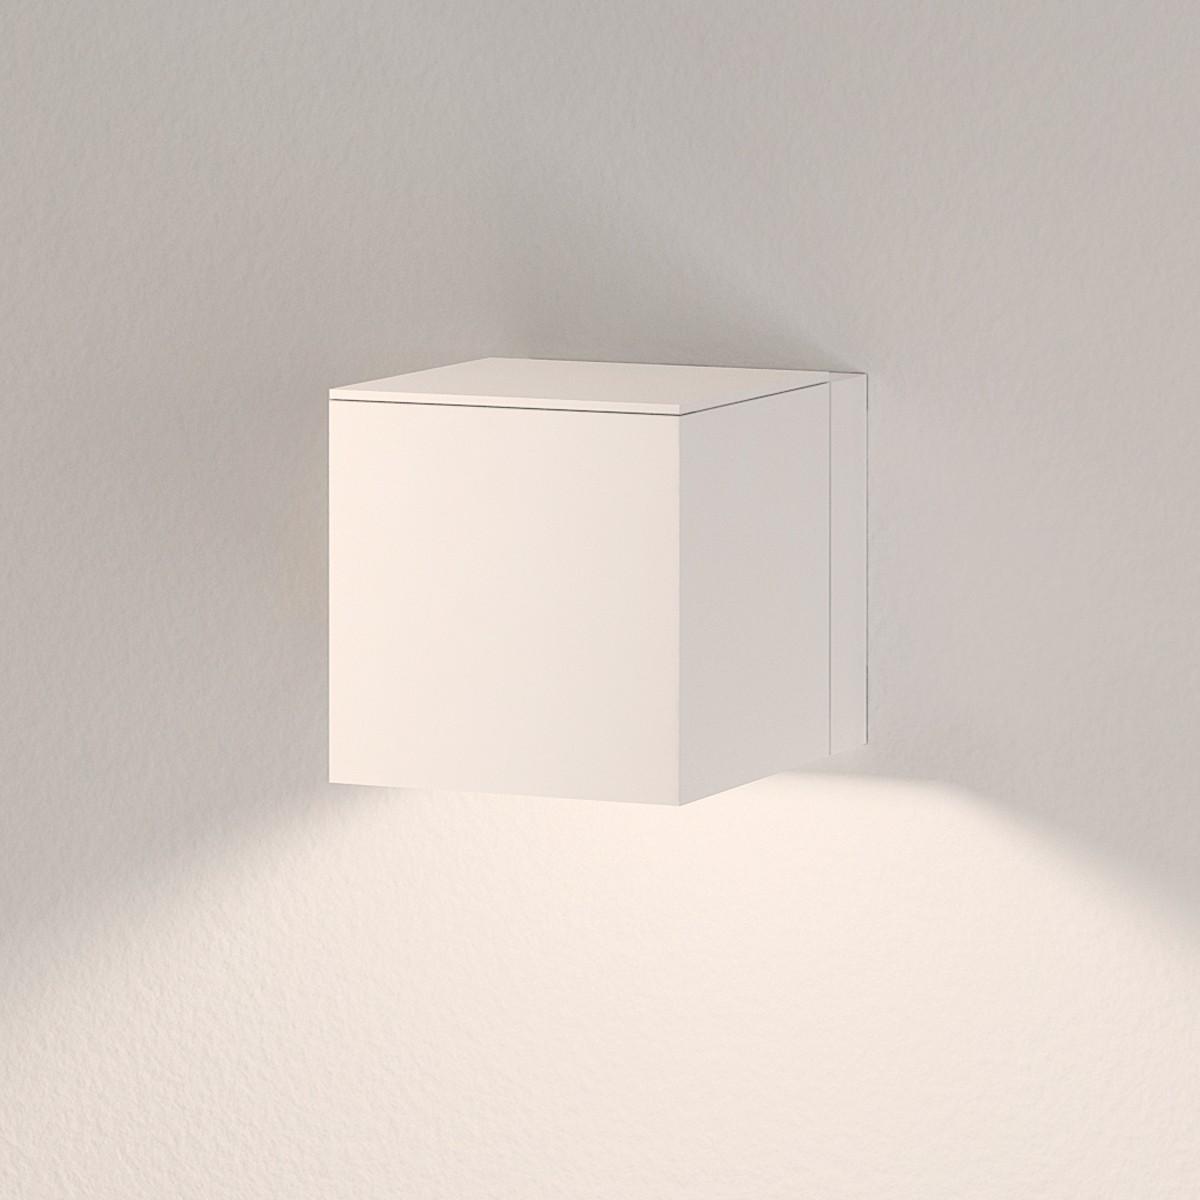 Milan Dau LED Wandleuchte, 1. Generation, weiß lackiert